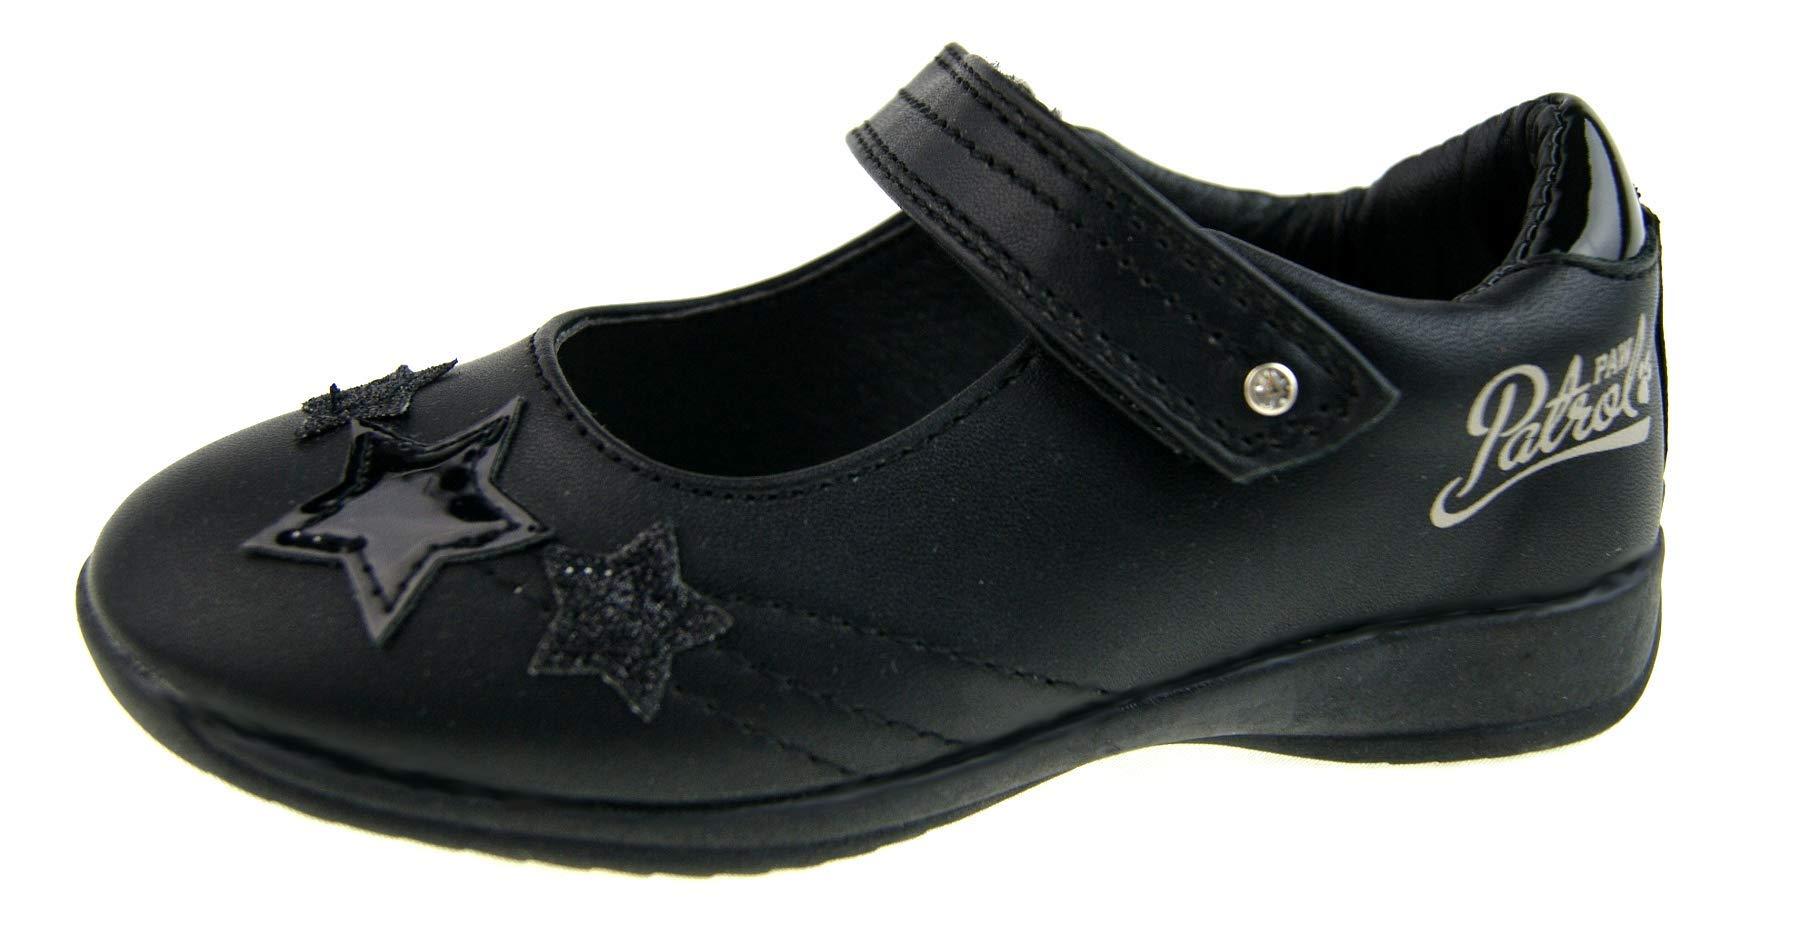 Paw Patrol Girls School Shoes- Buy